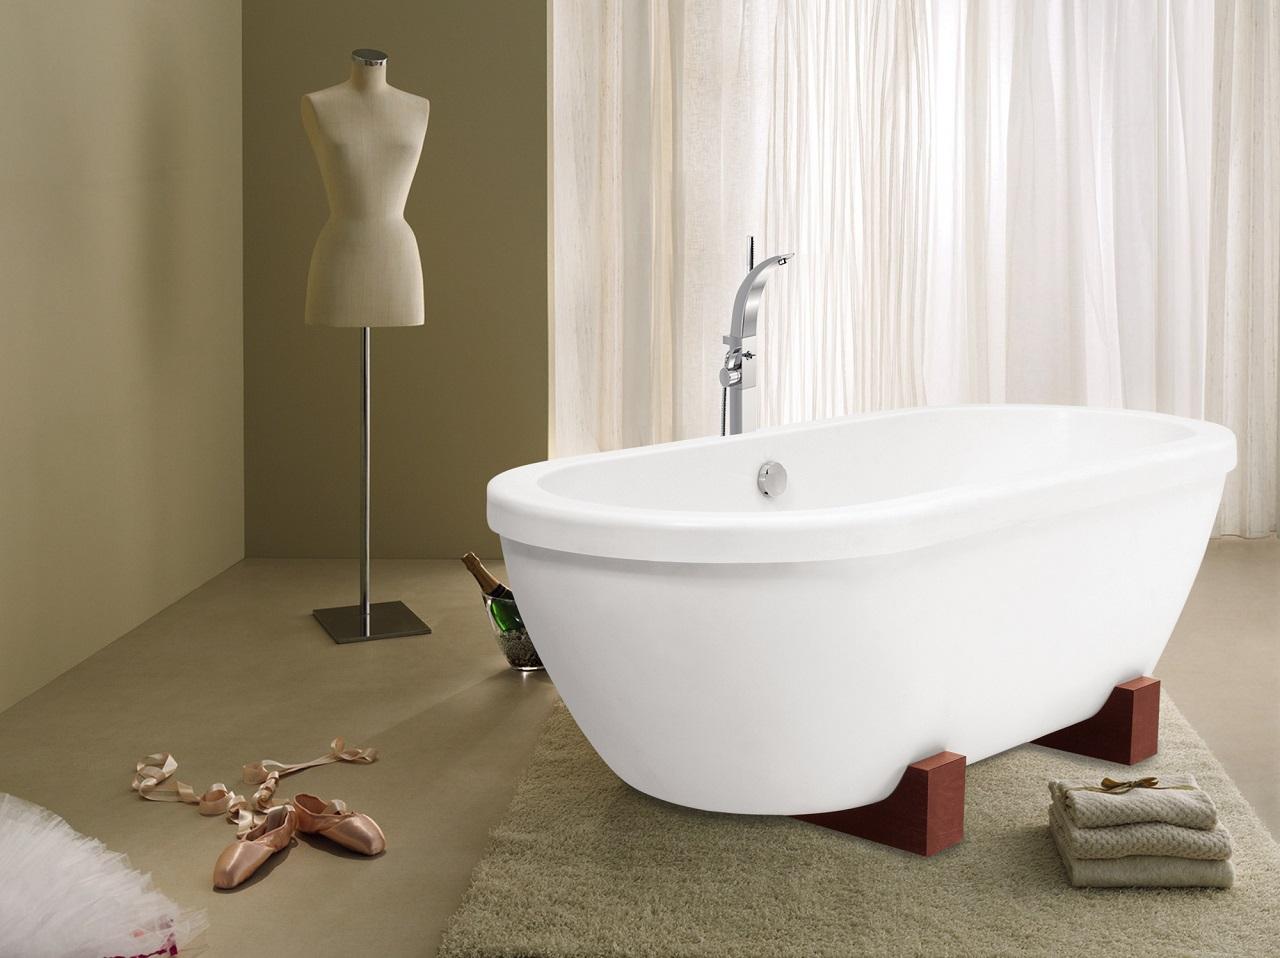 Vasca Da Bagno Vintage Prezzi : Adoreme vasca in pietra freestanding bianca peso piuma di aquatica